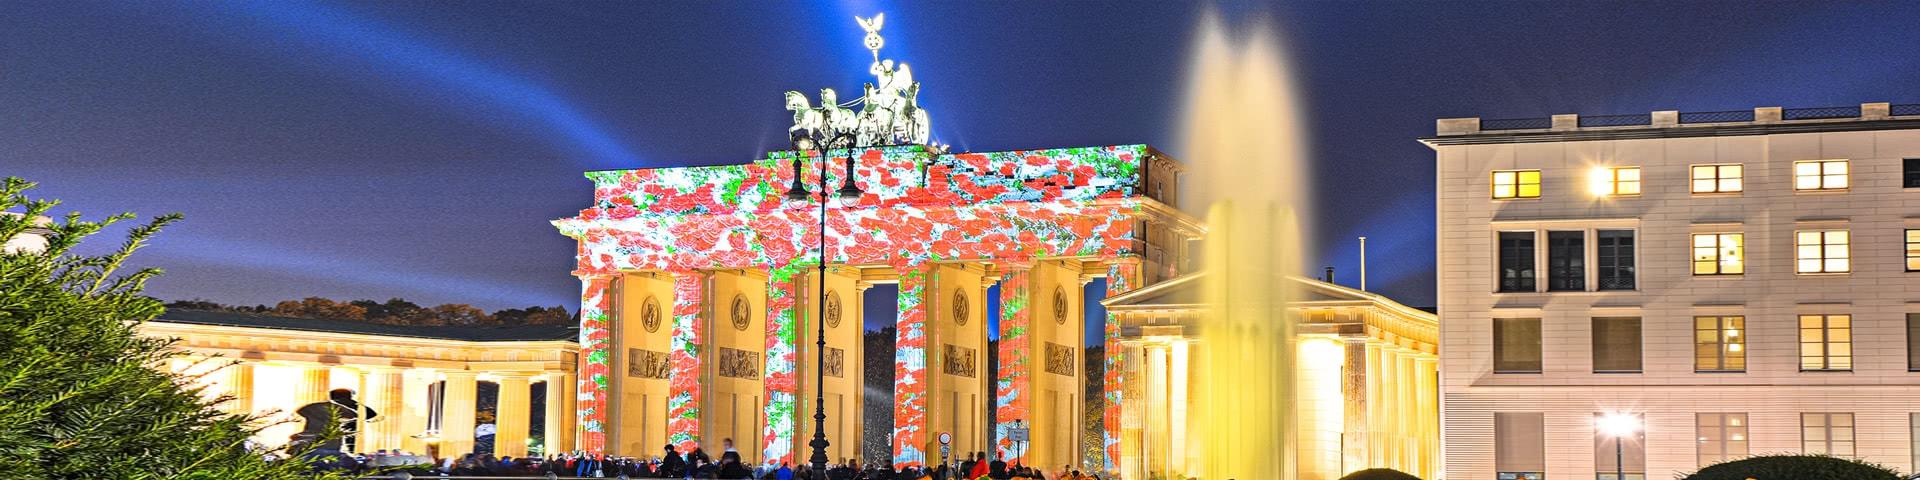 Kunstvoll beleuchtetes Brandenburger Tor in Berlin